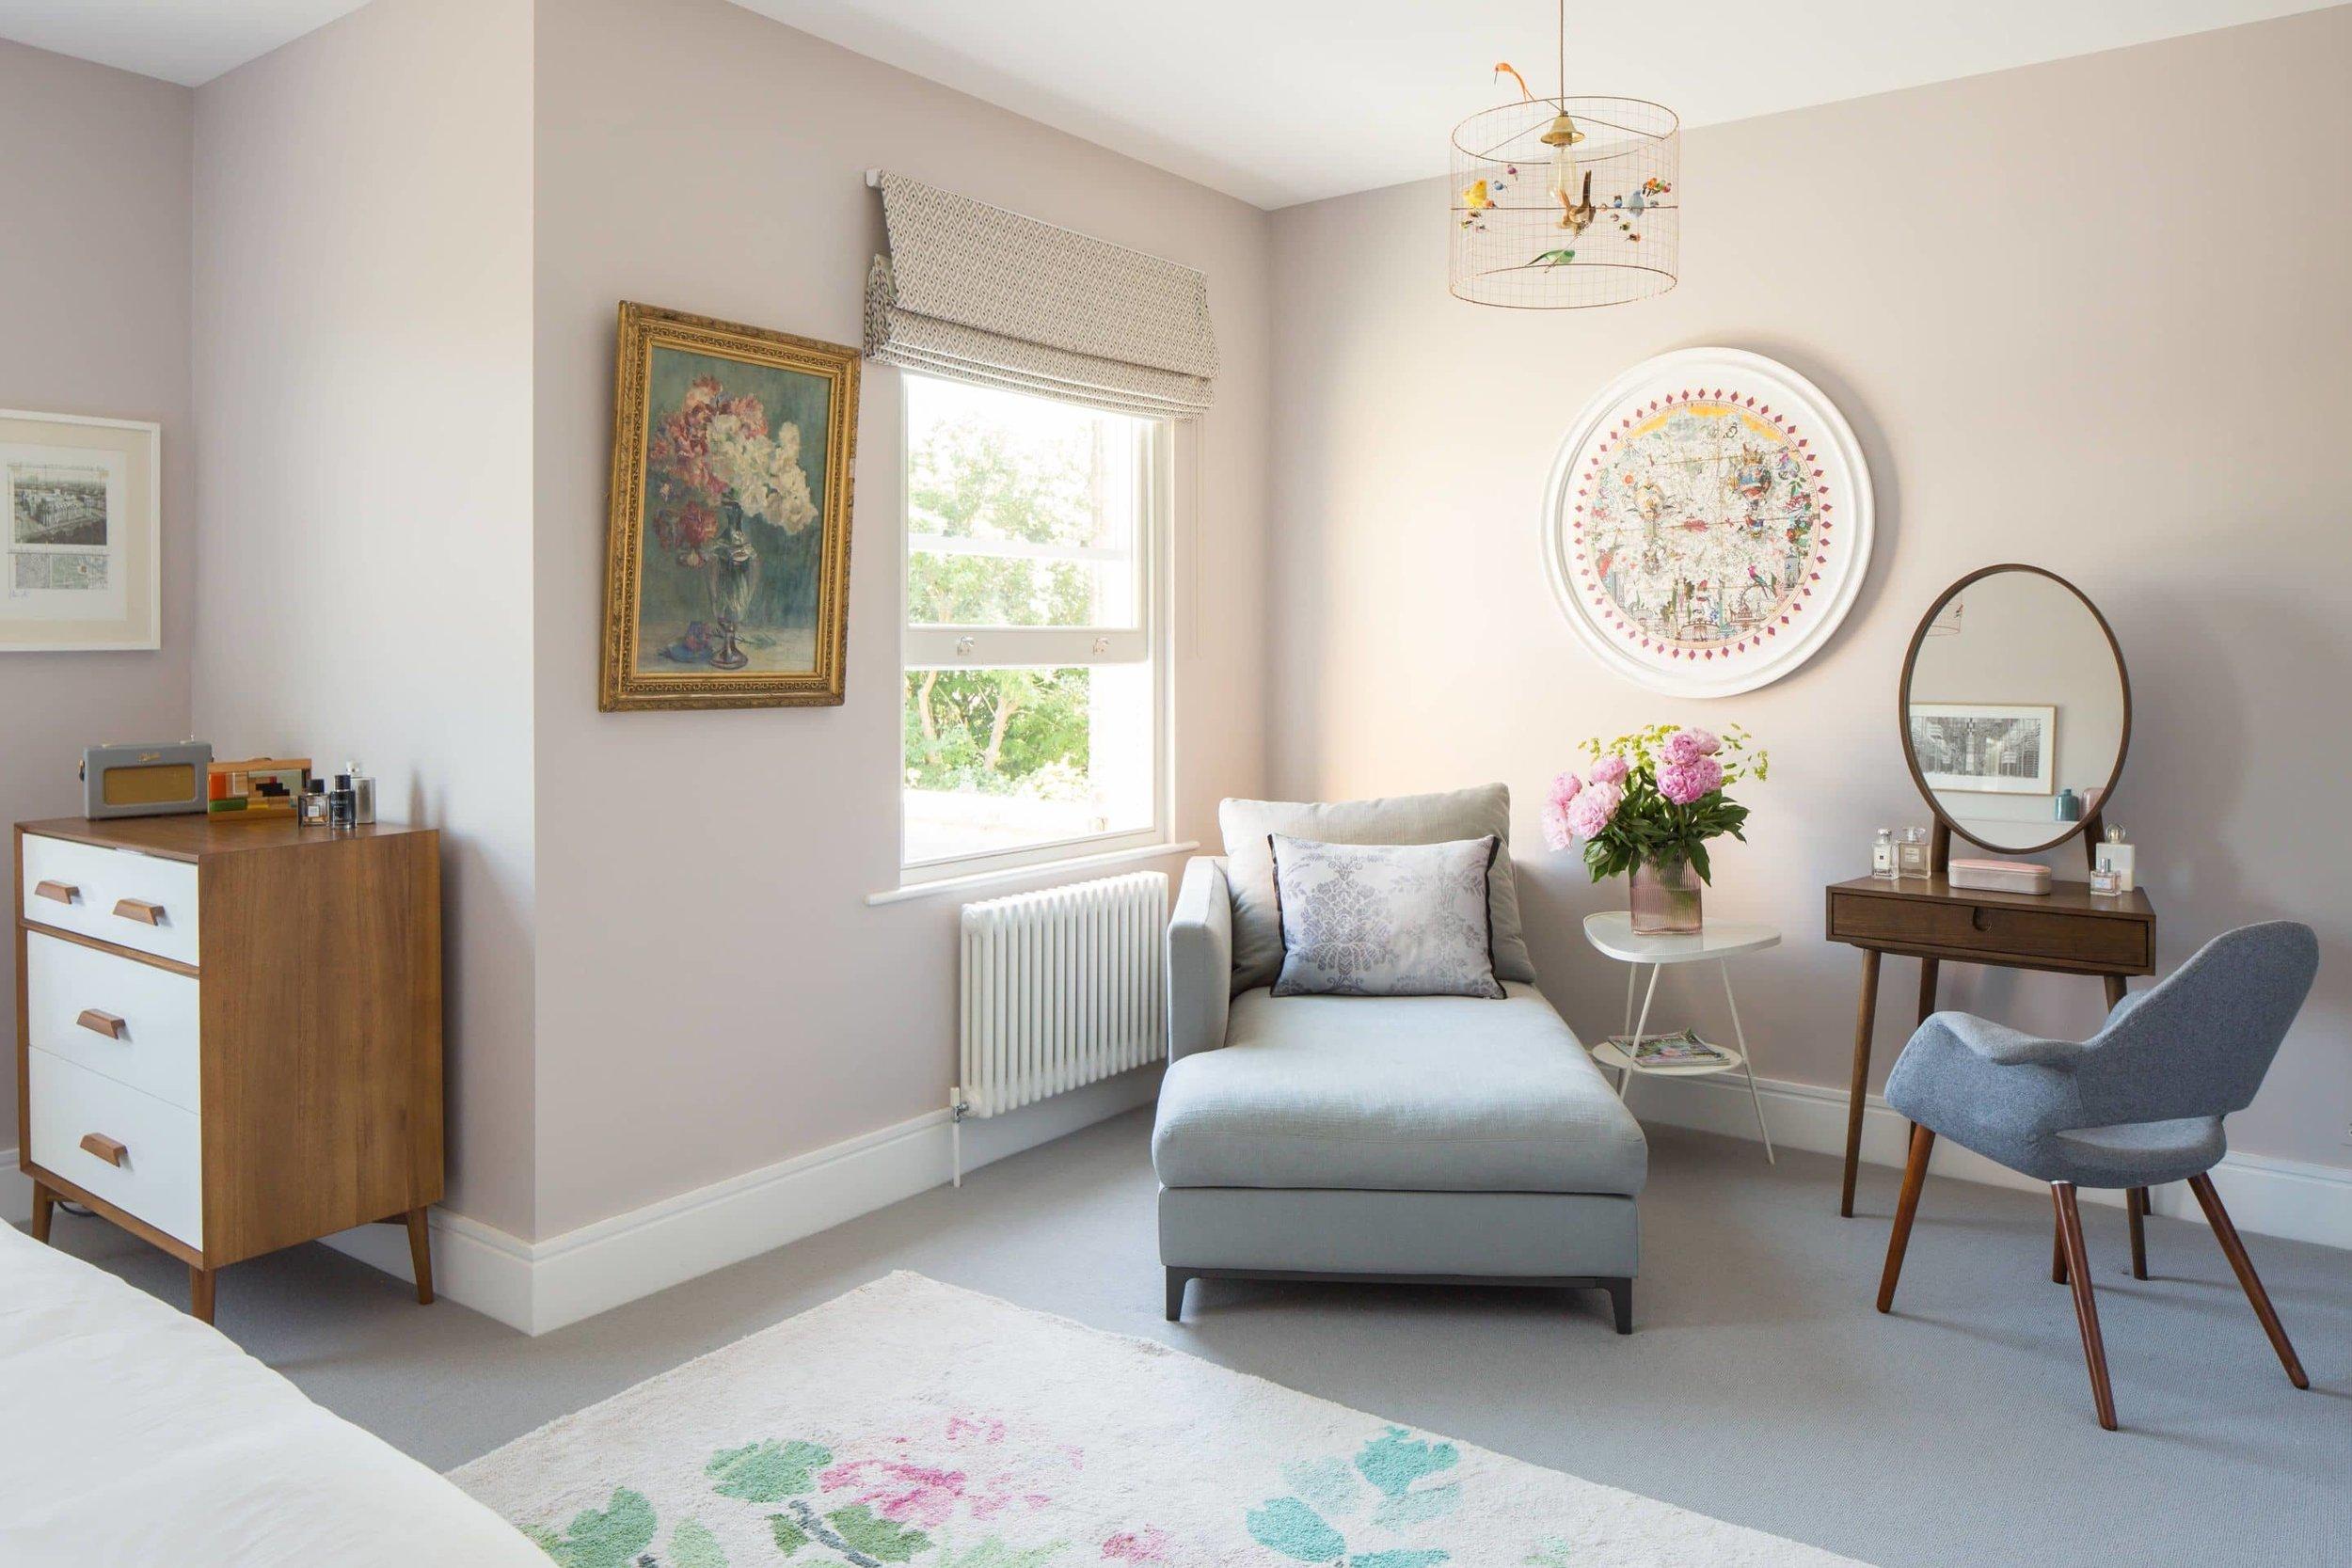 Fulham-Master-Bedroom-Suite-Refurbishment-London-10.jpg